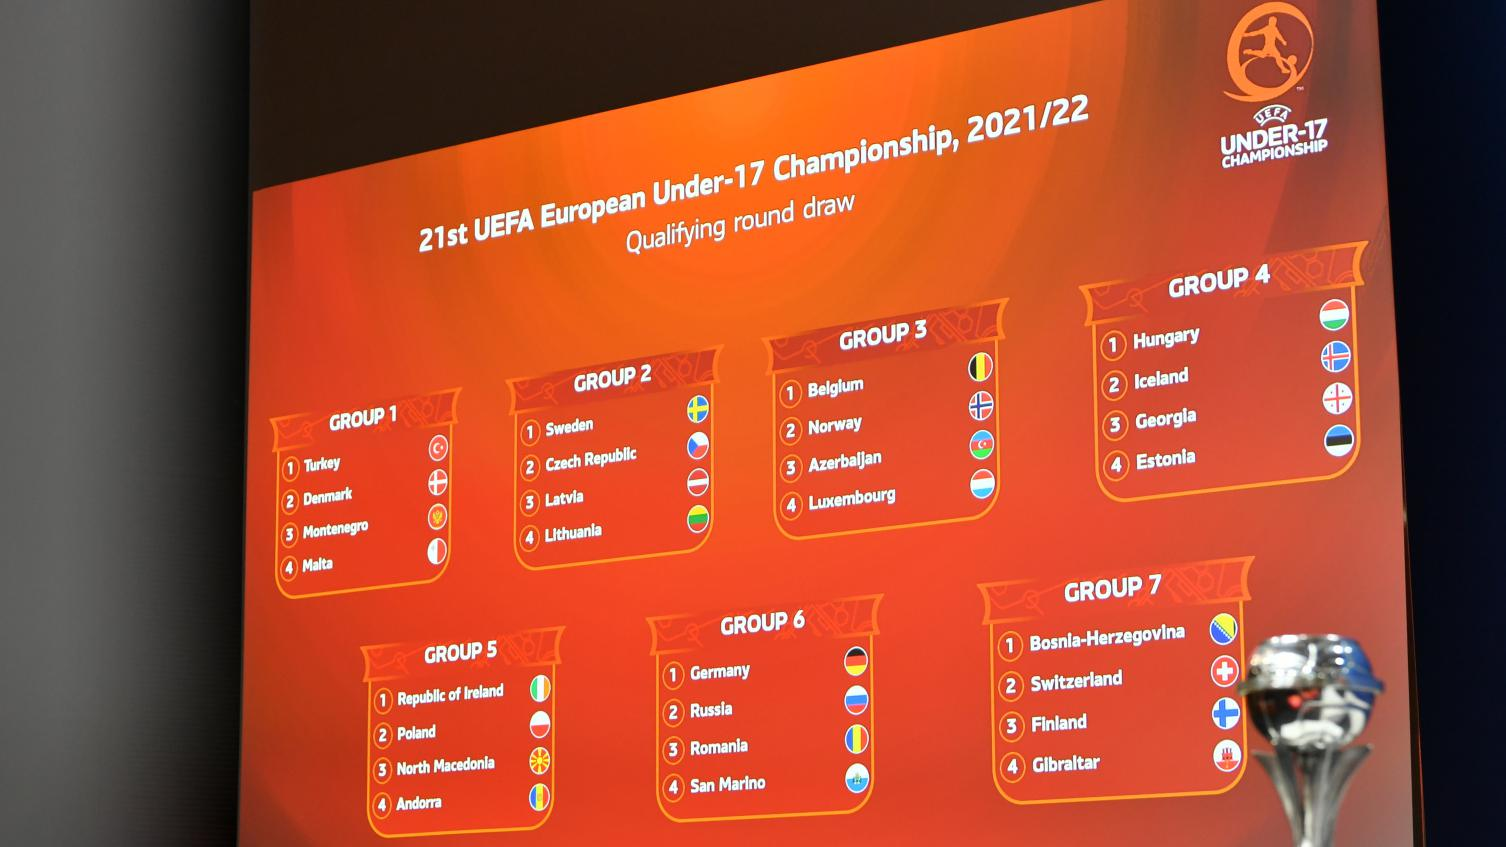 2021/22 U17 qualifying round groups